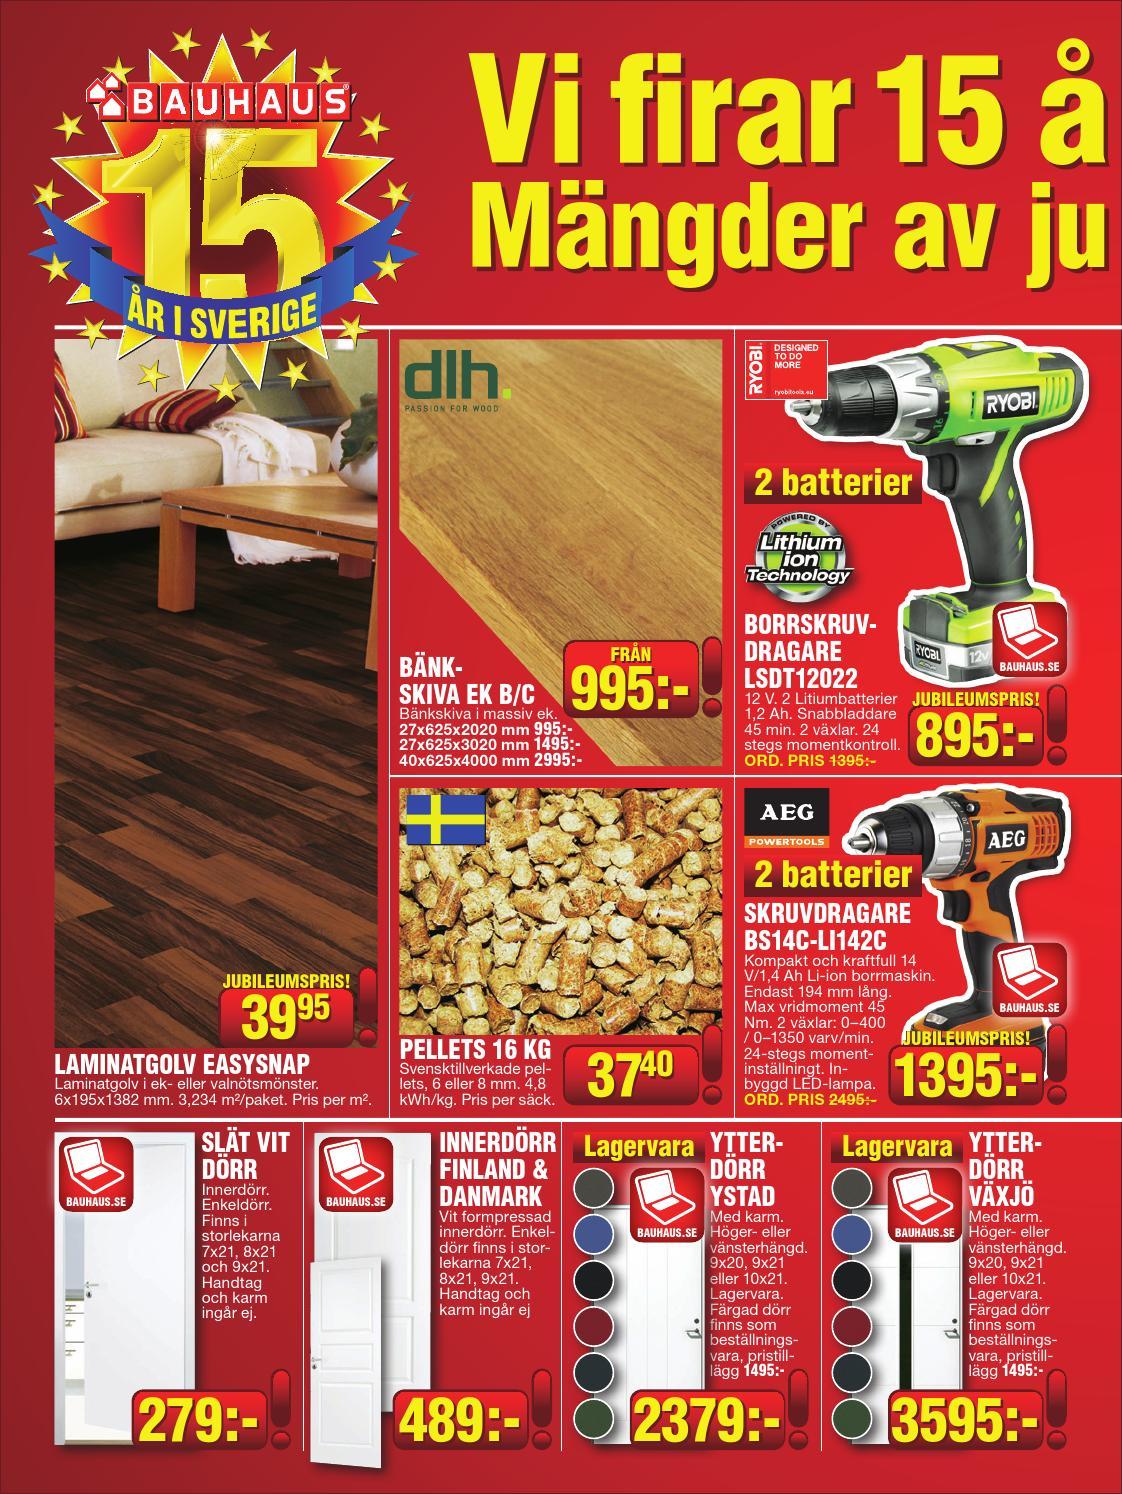 vi i villa nr 2 2012 by vi i villa issuu. Black Bedroom Furniture Sets. Home Design Ideas